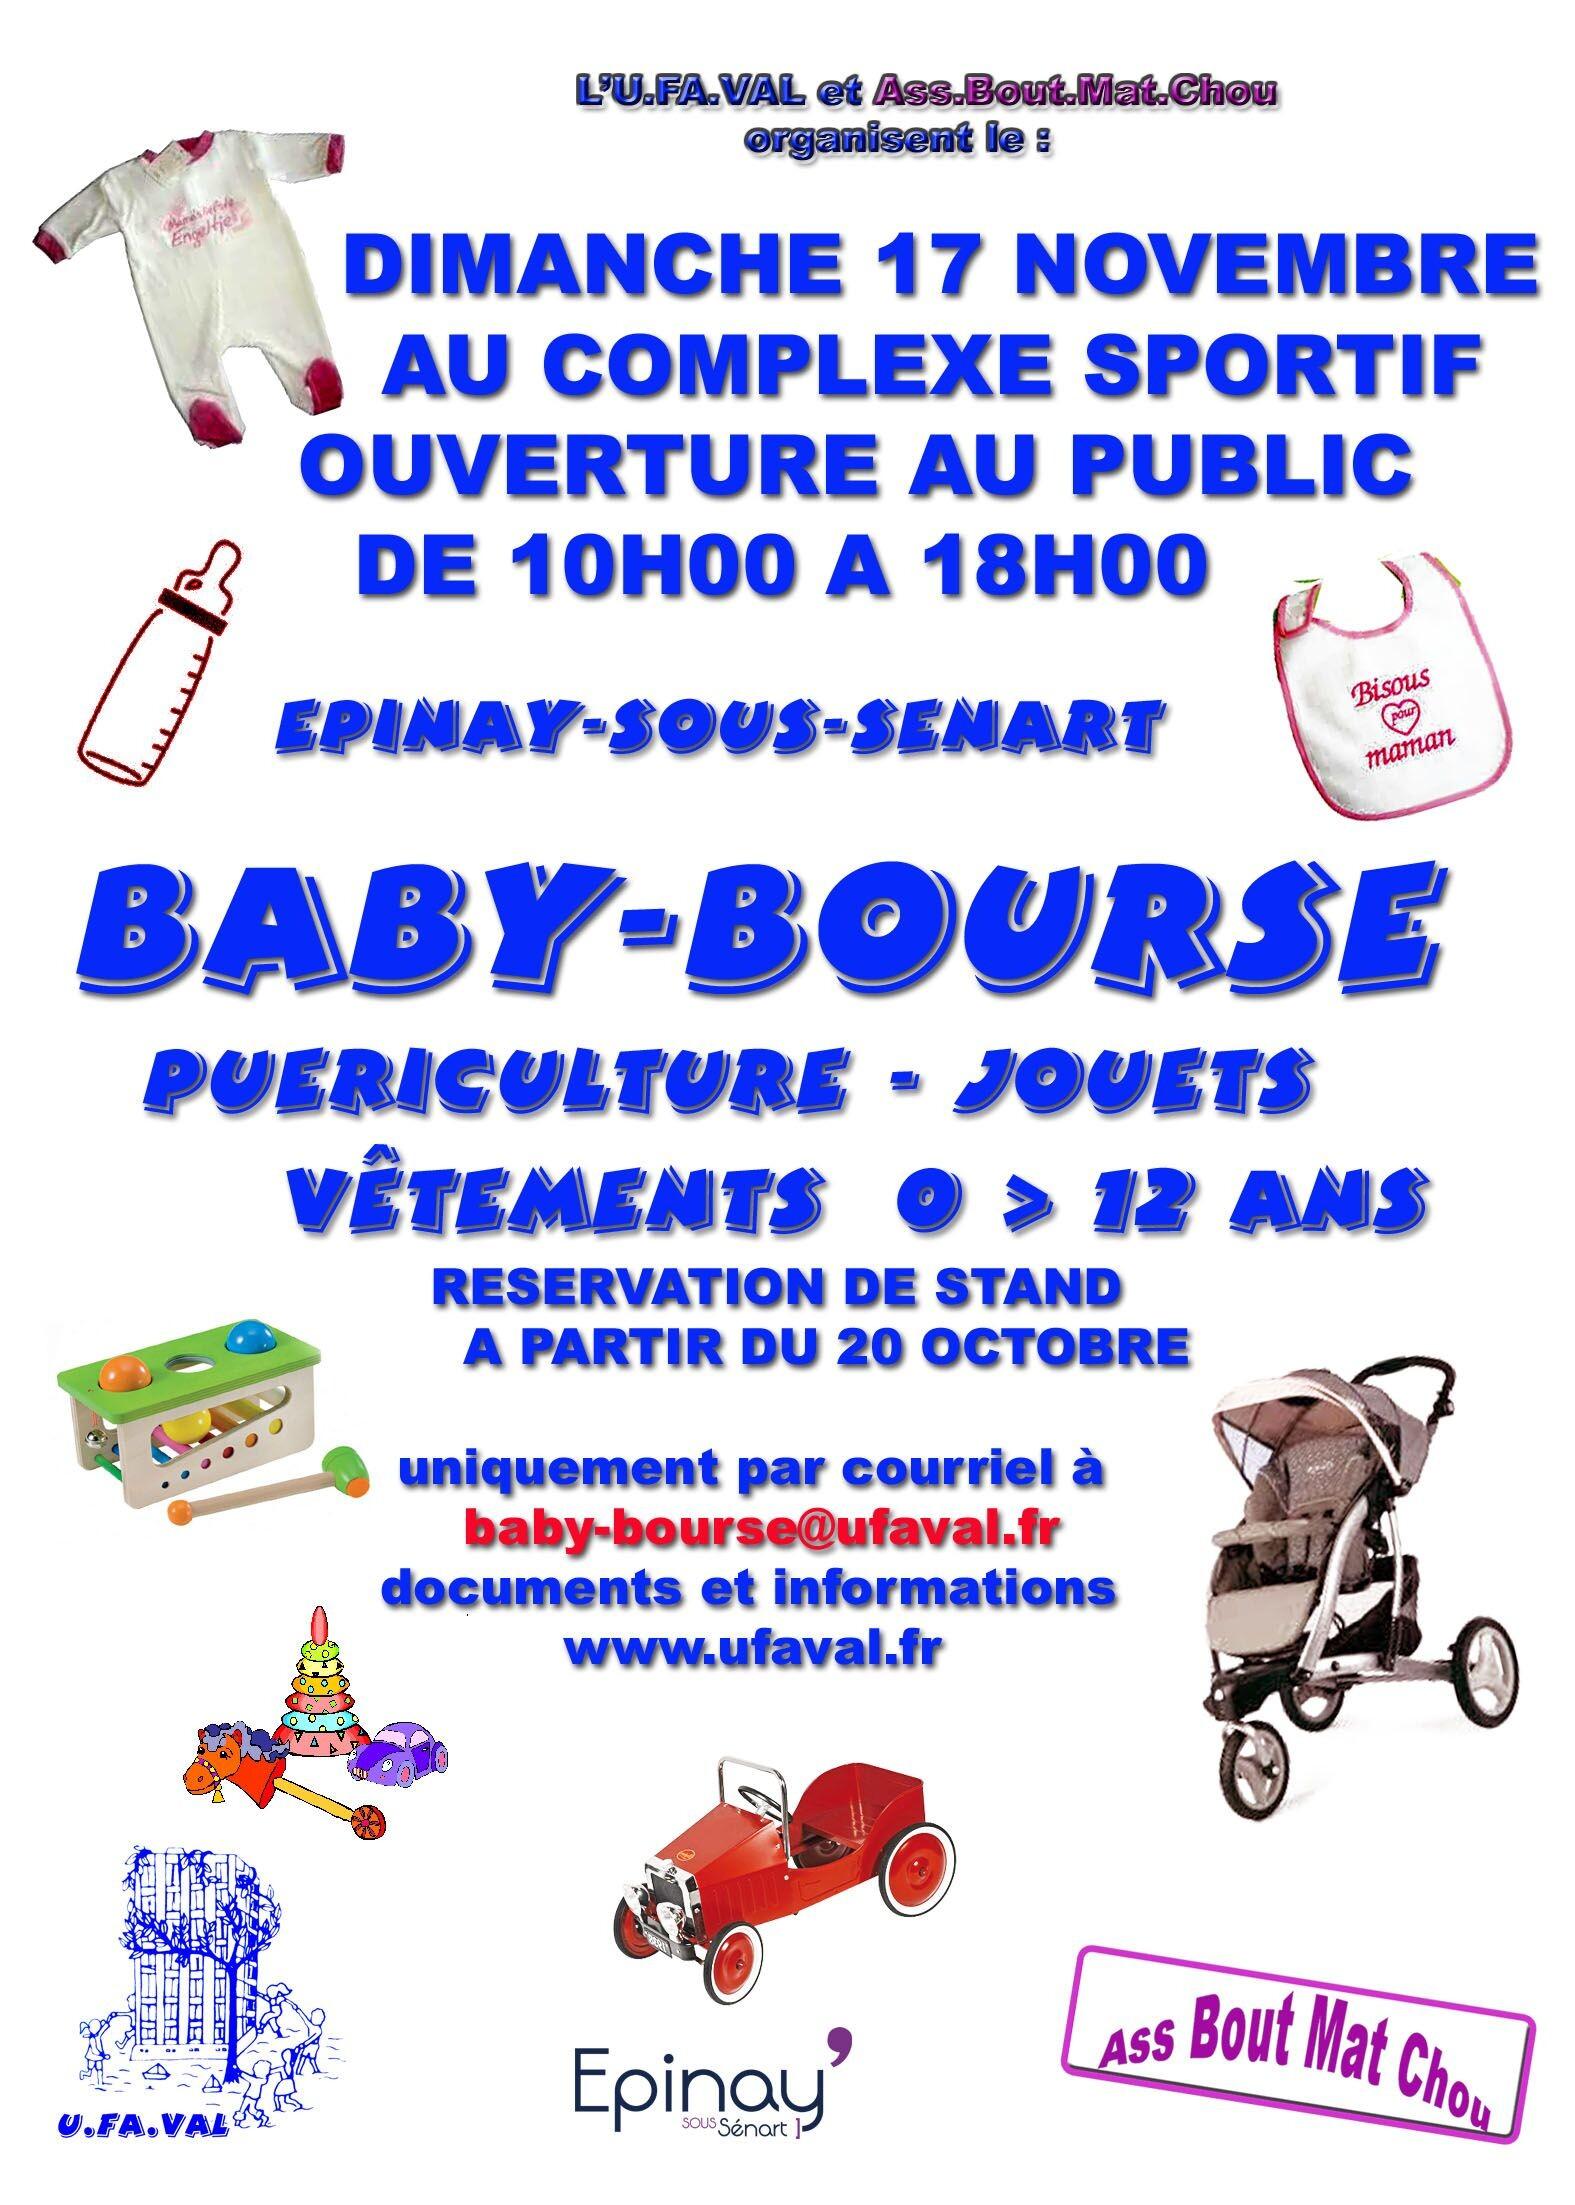 Baby bourse